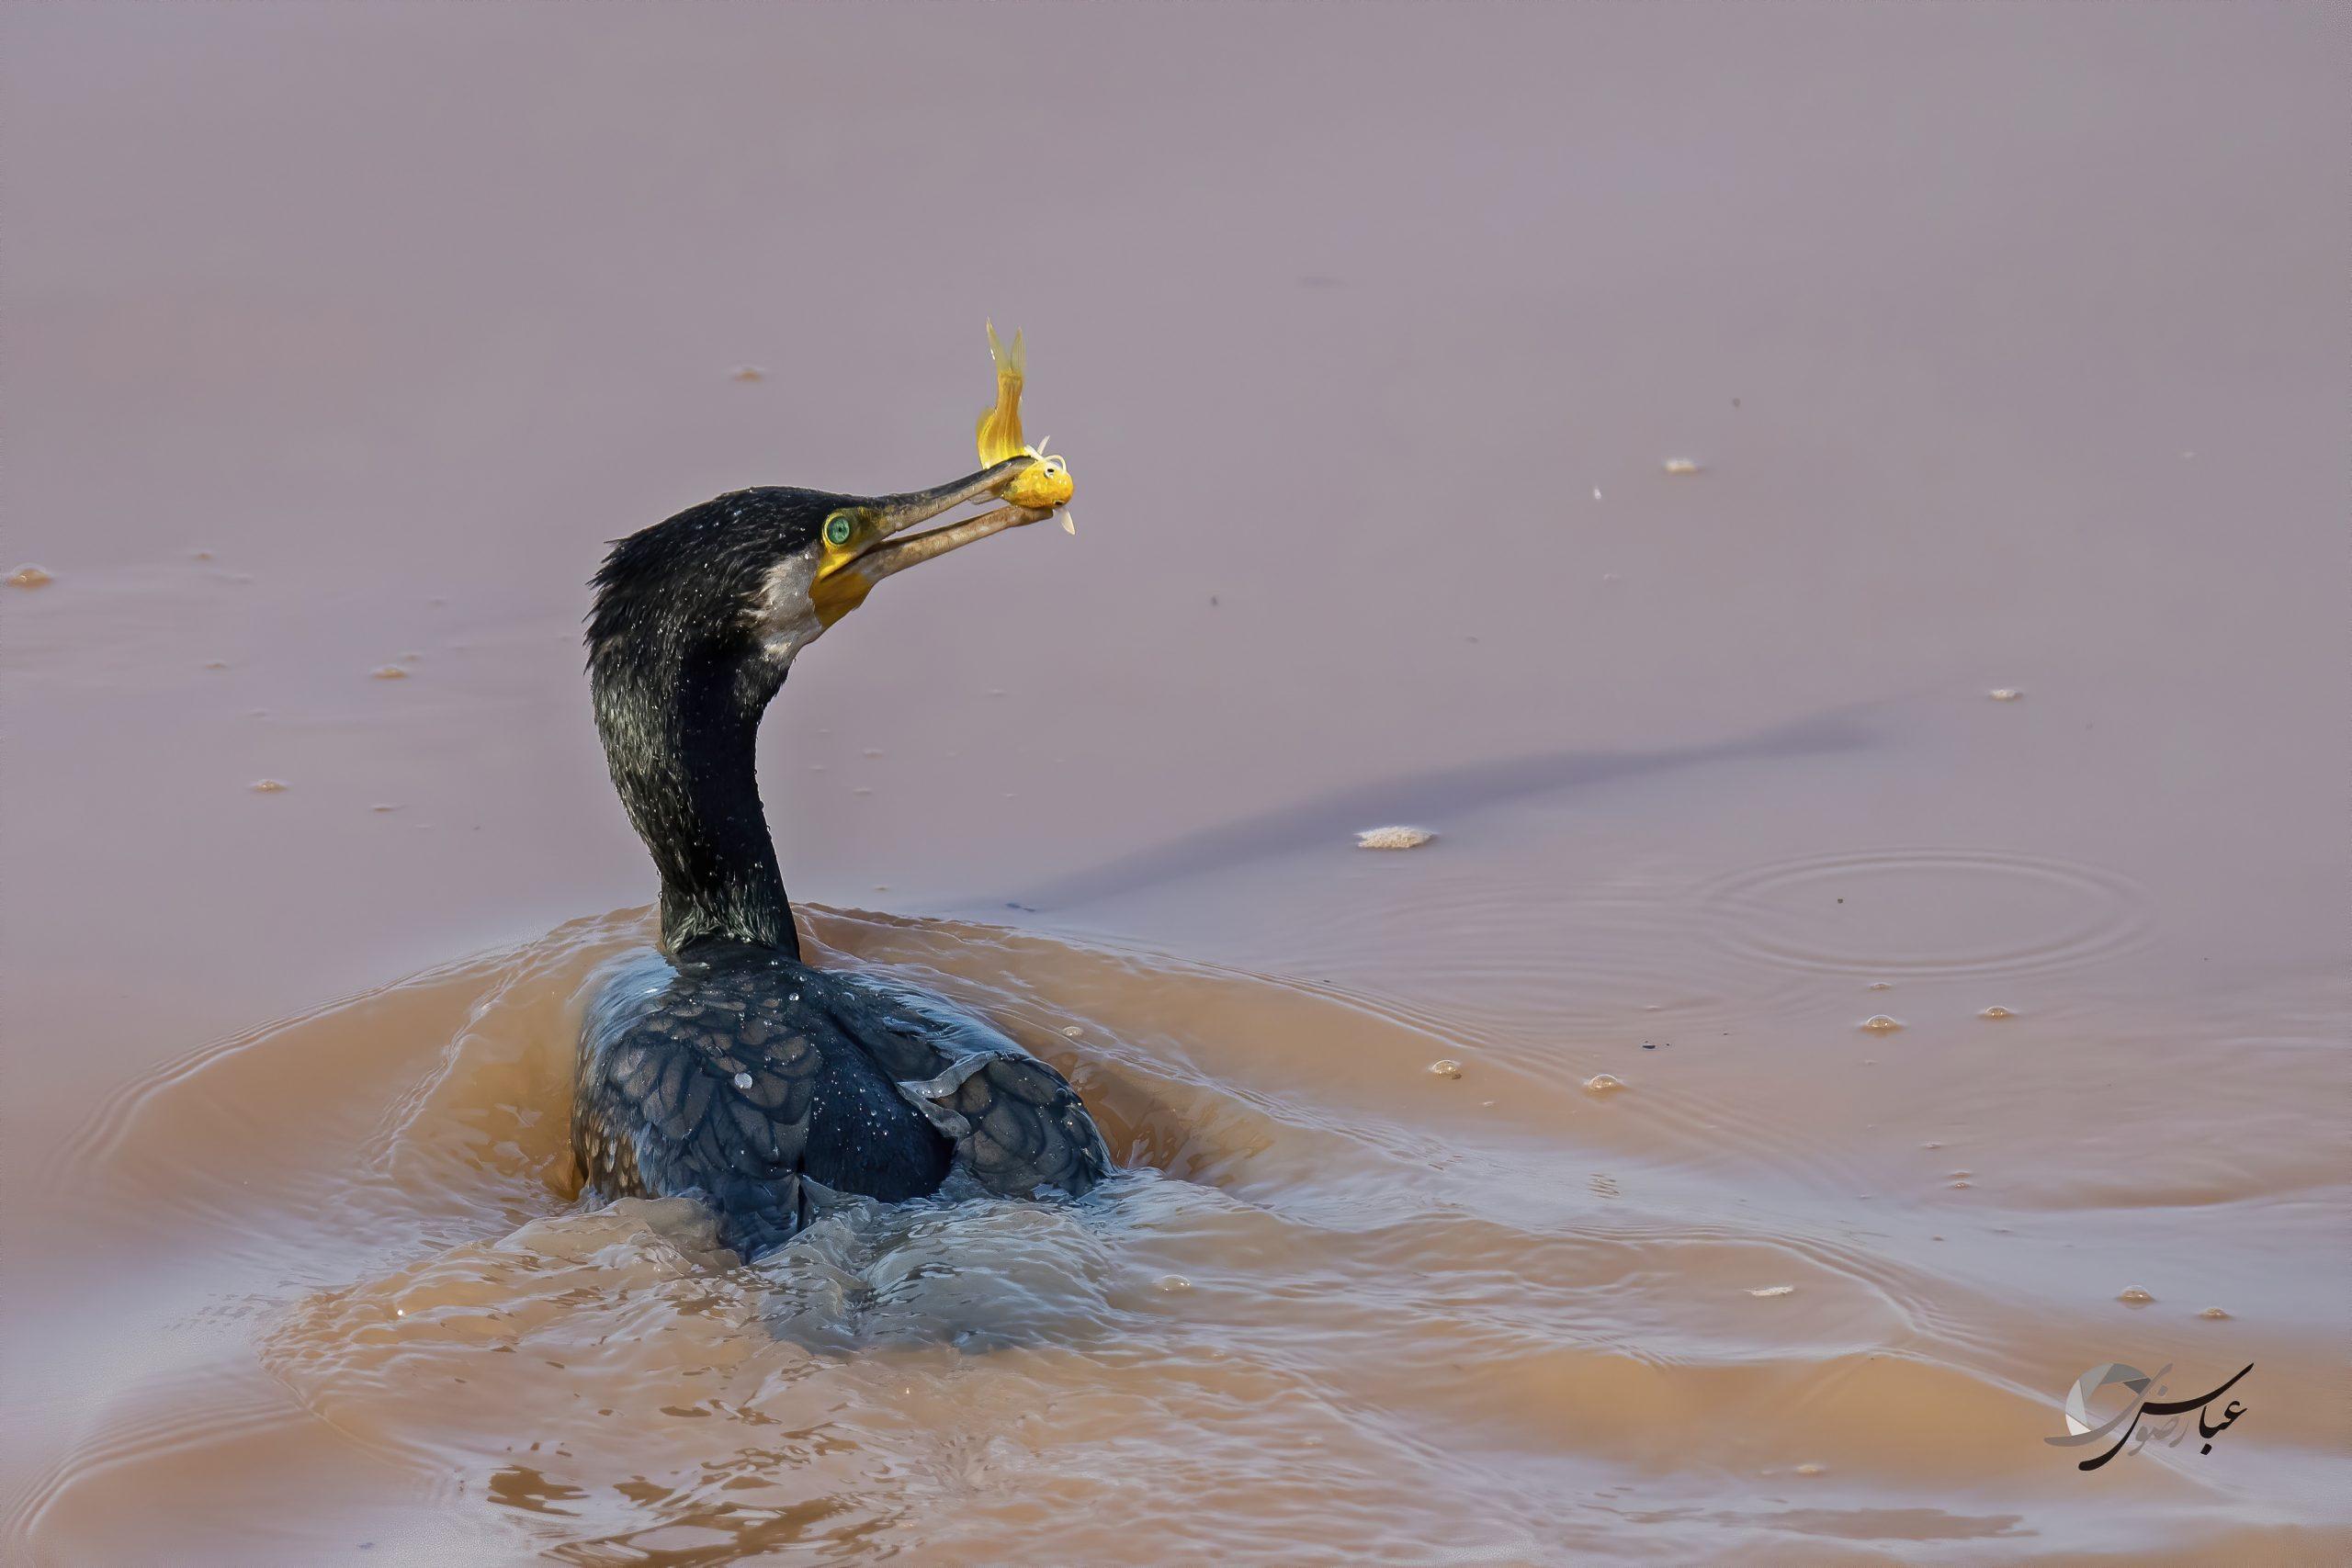 Great Cormorant catch the Goldfish